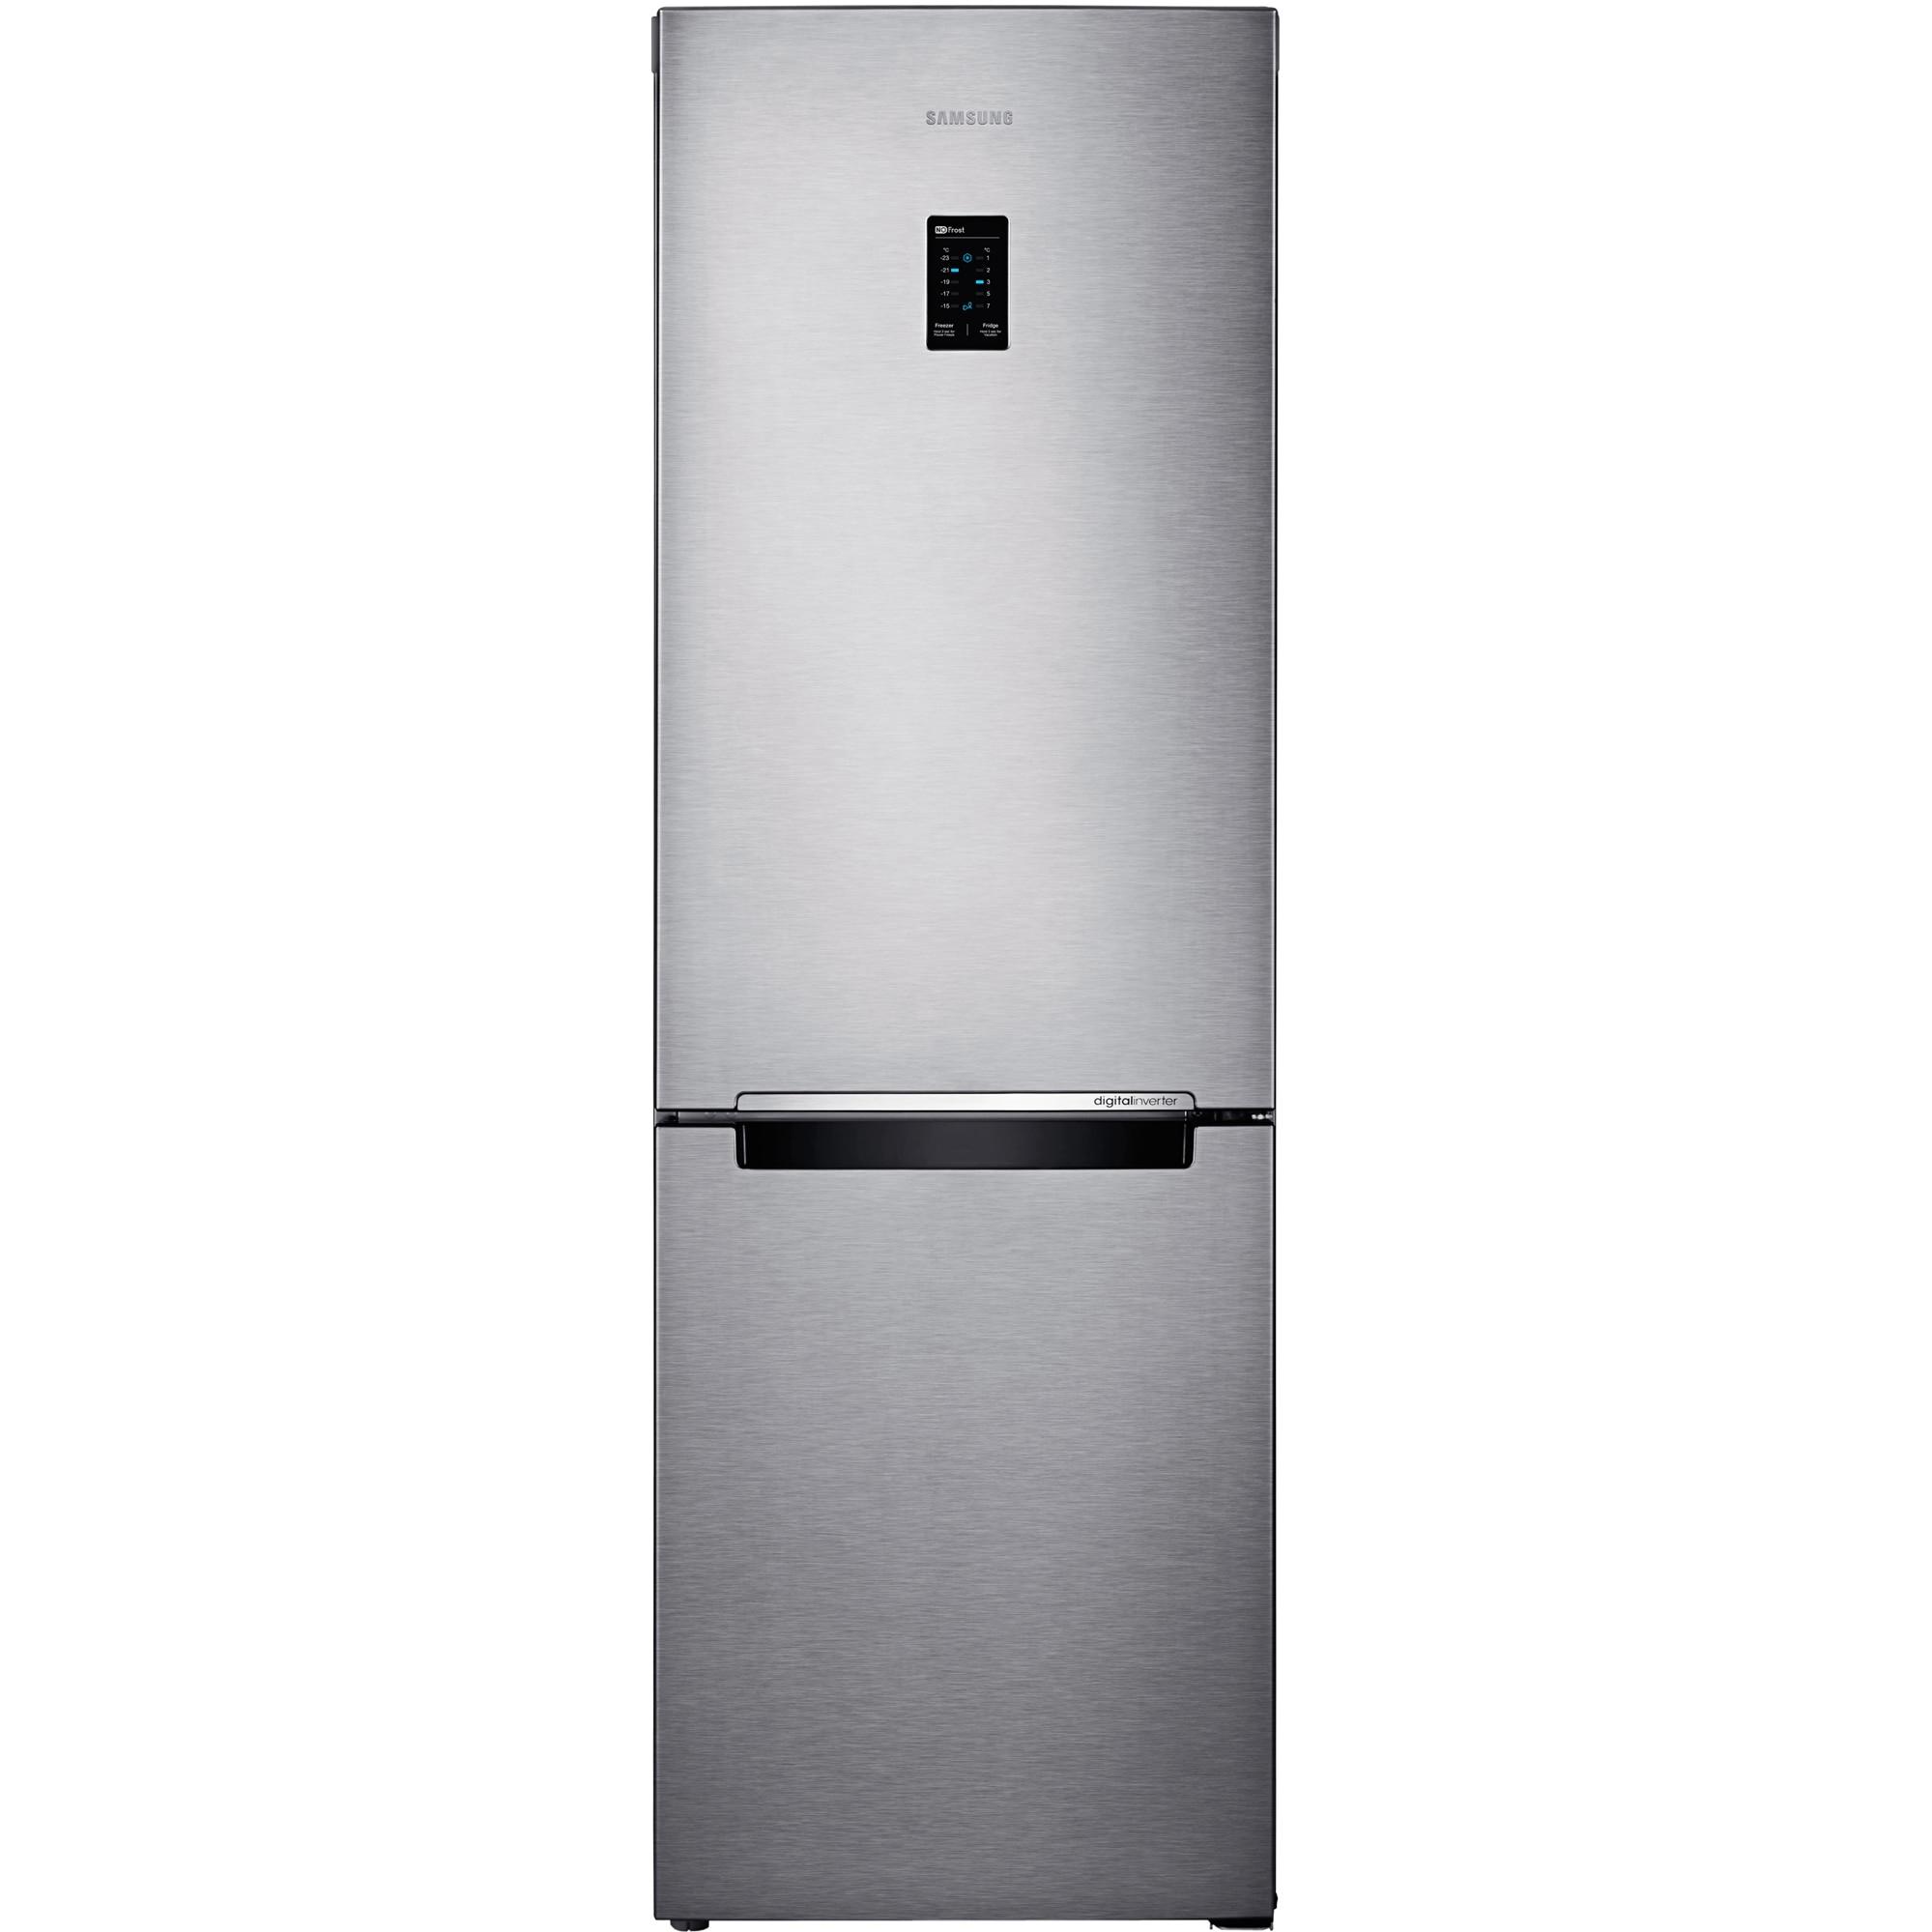 Fotografie Combina frigorifica Samsung RB31FERNDSA, 310 l, Clasa A+, No Frost, Compresor Digital Inverter, H 185 cm, Argintiu